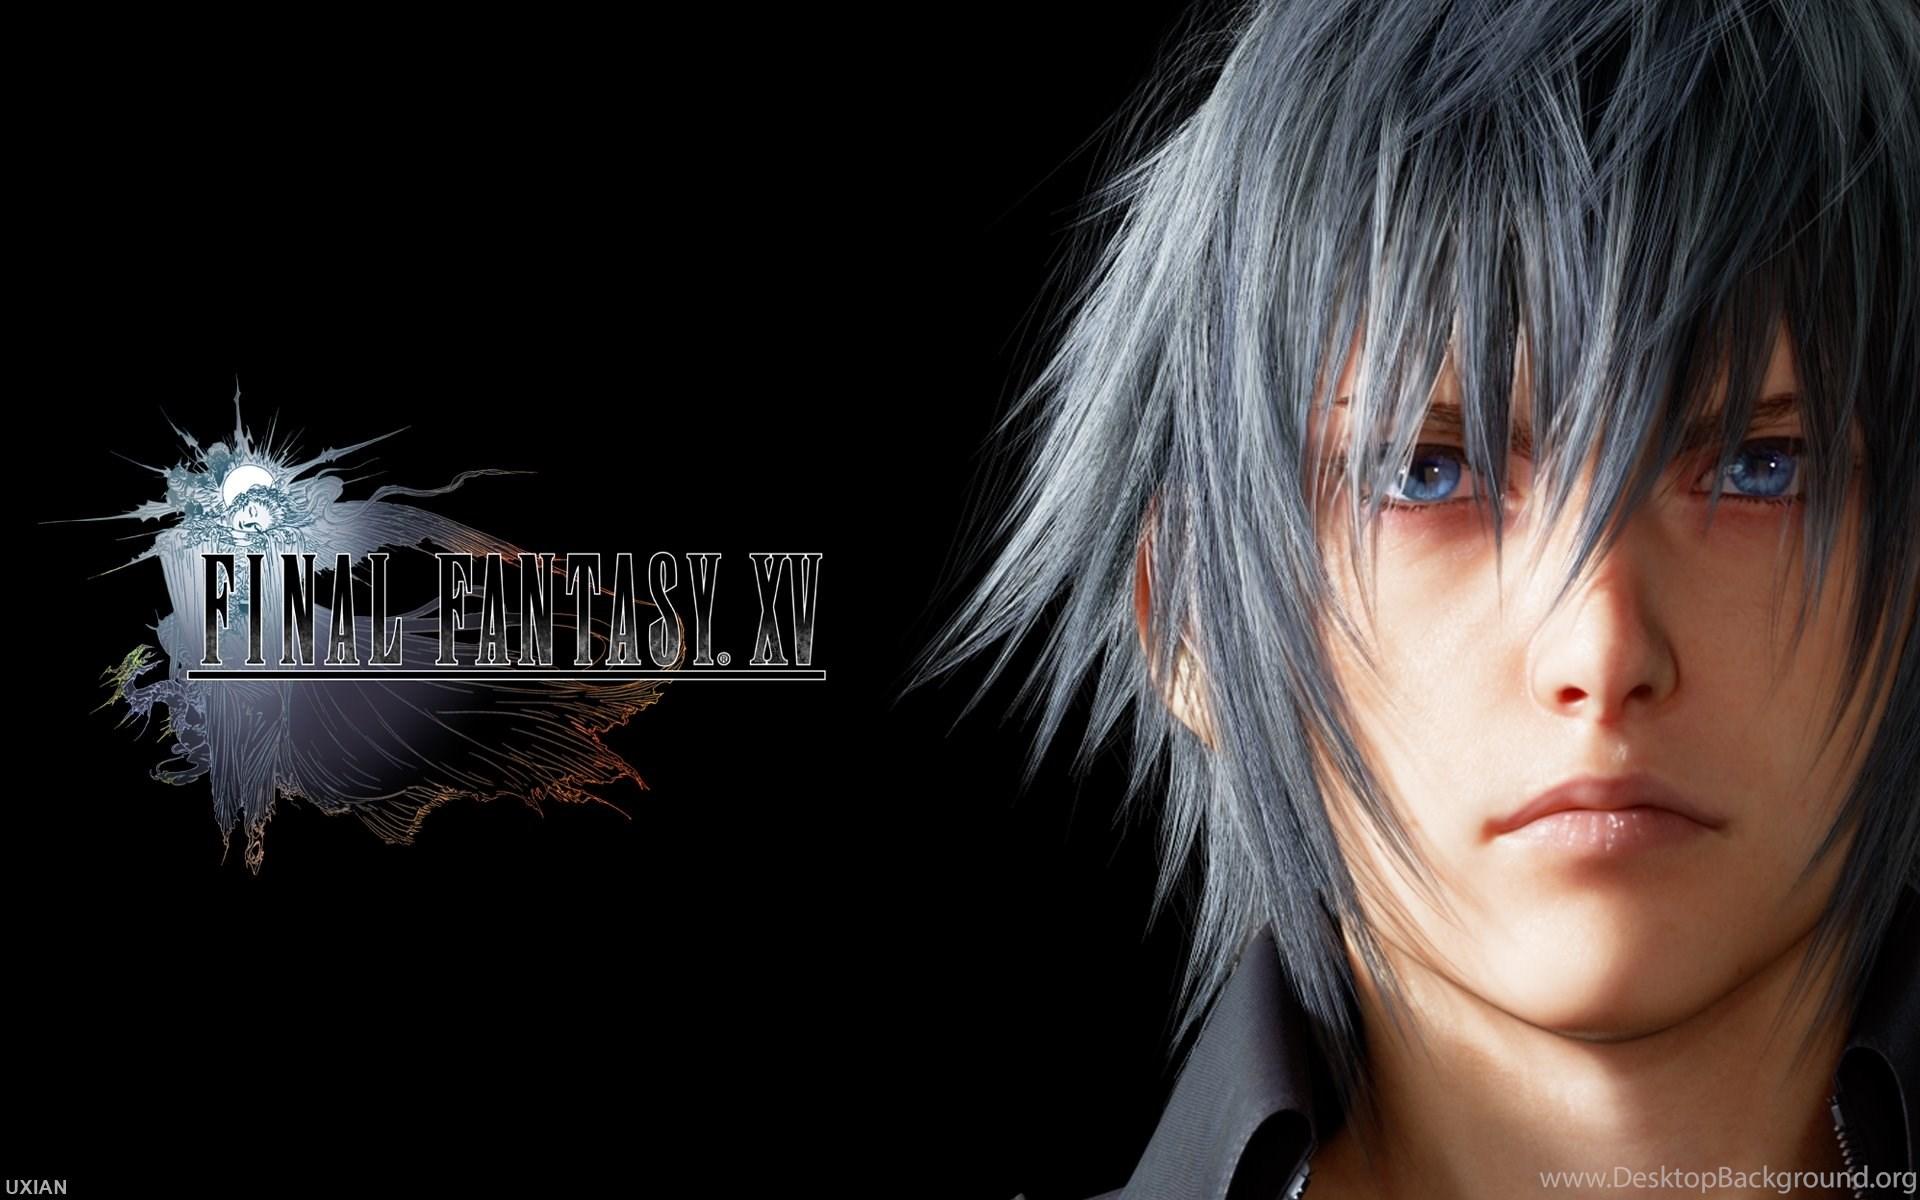 Download Final Fantasy 15 Wallpapers Phone Desktop Background